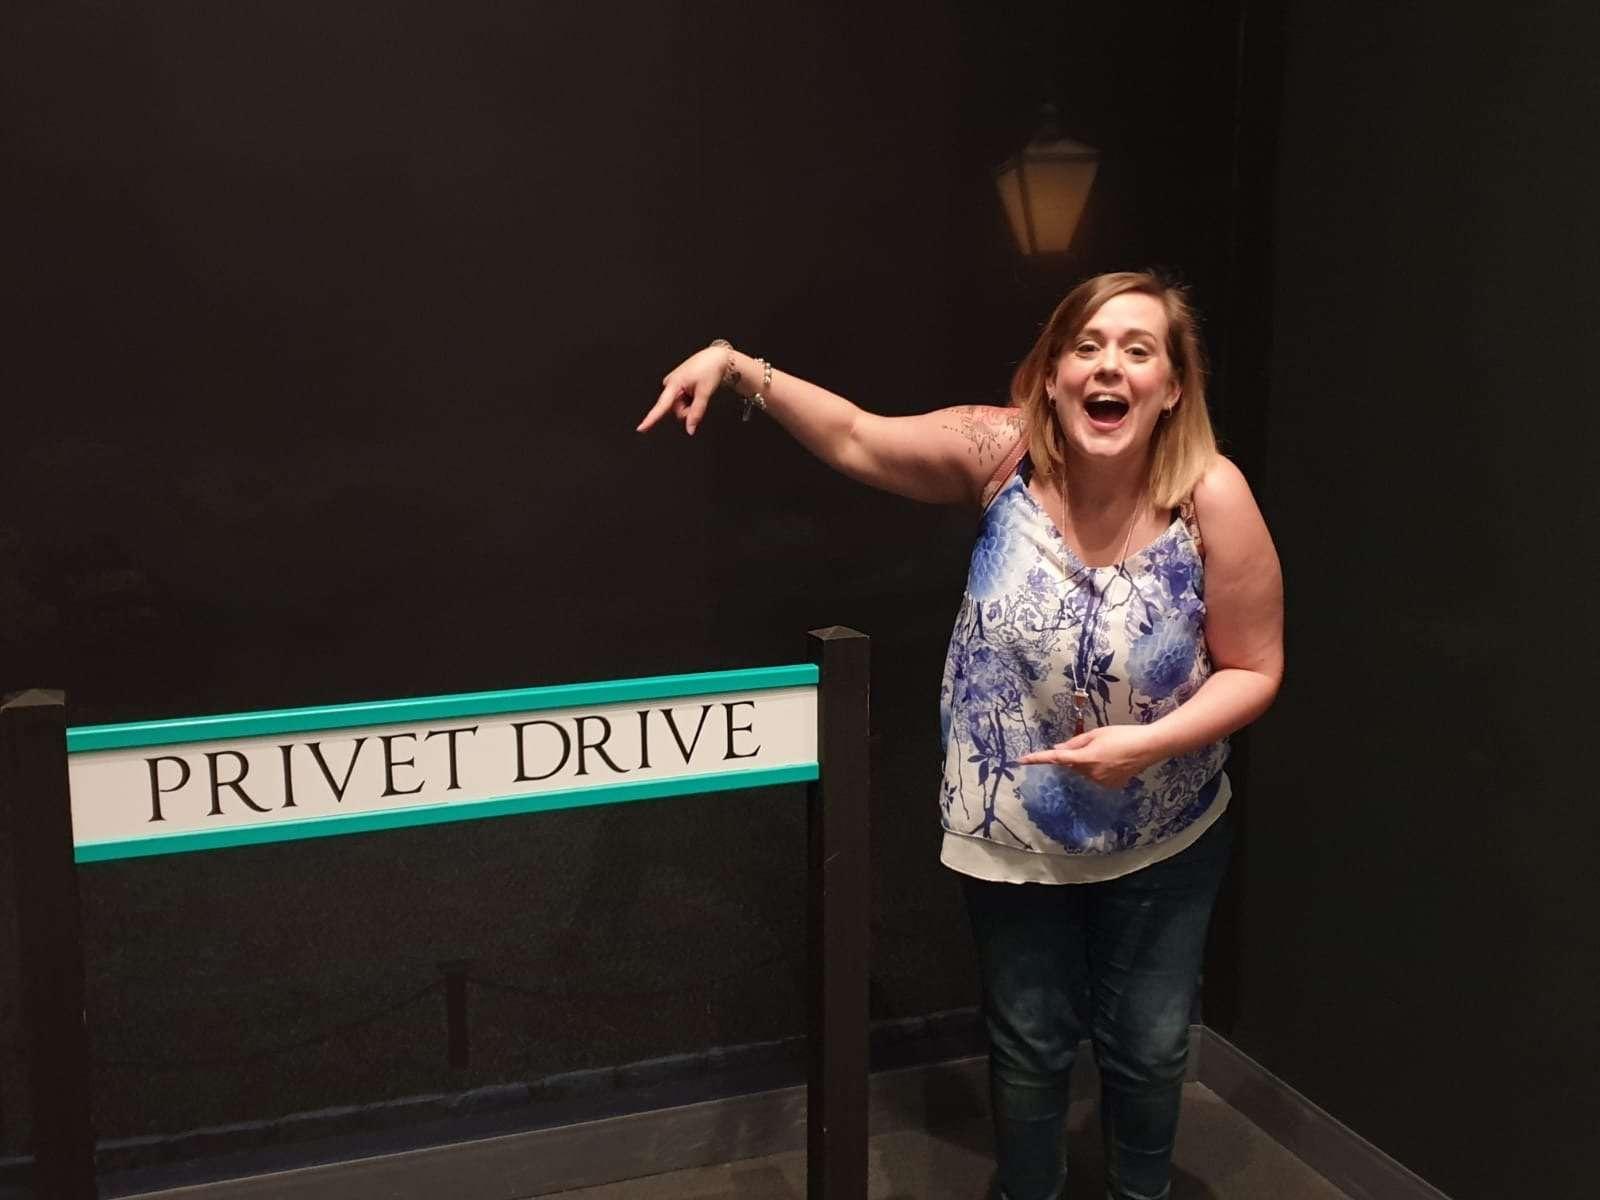 Harry-Potter-Studio-tour-2